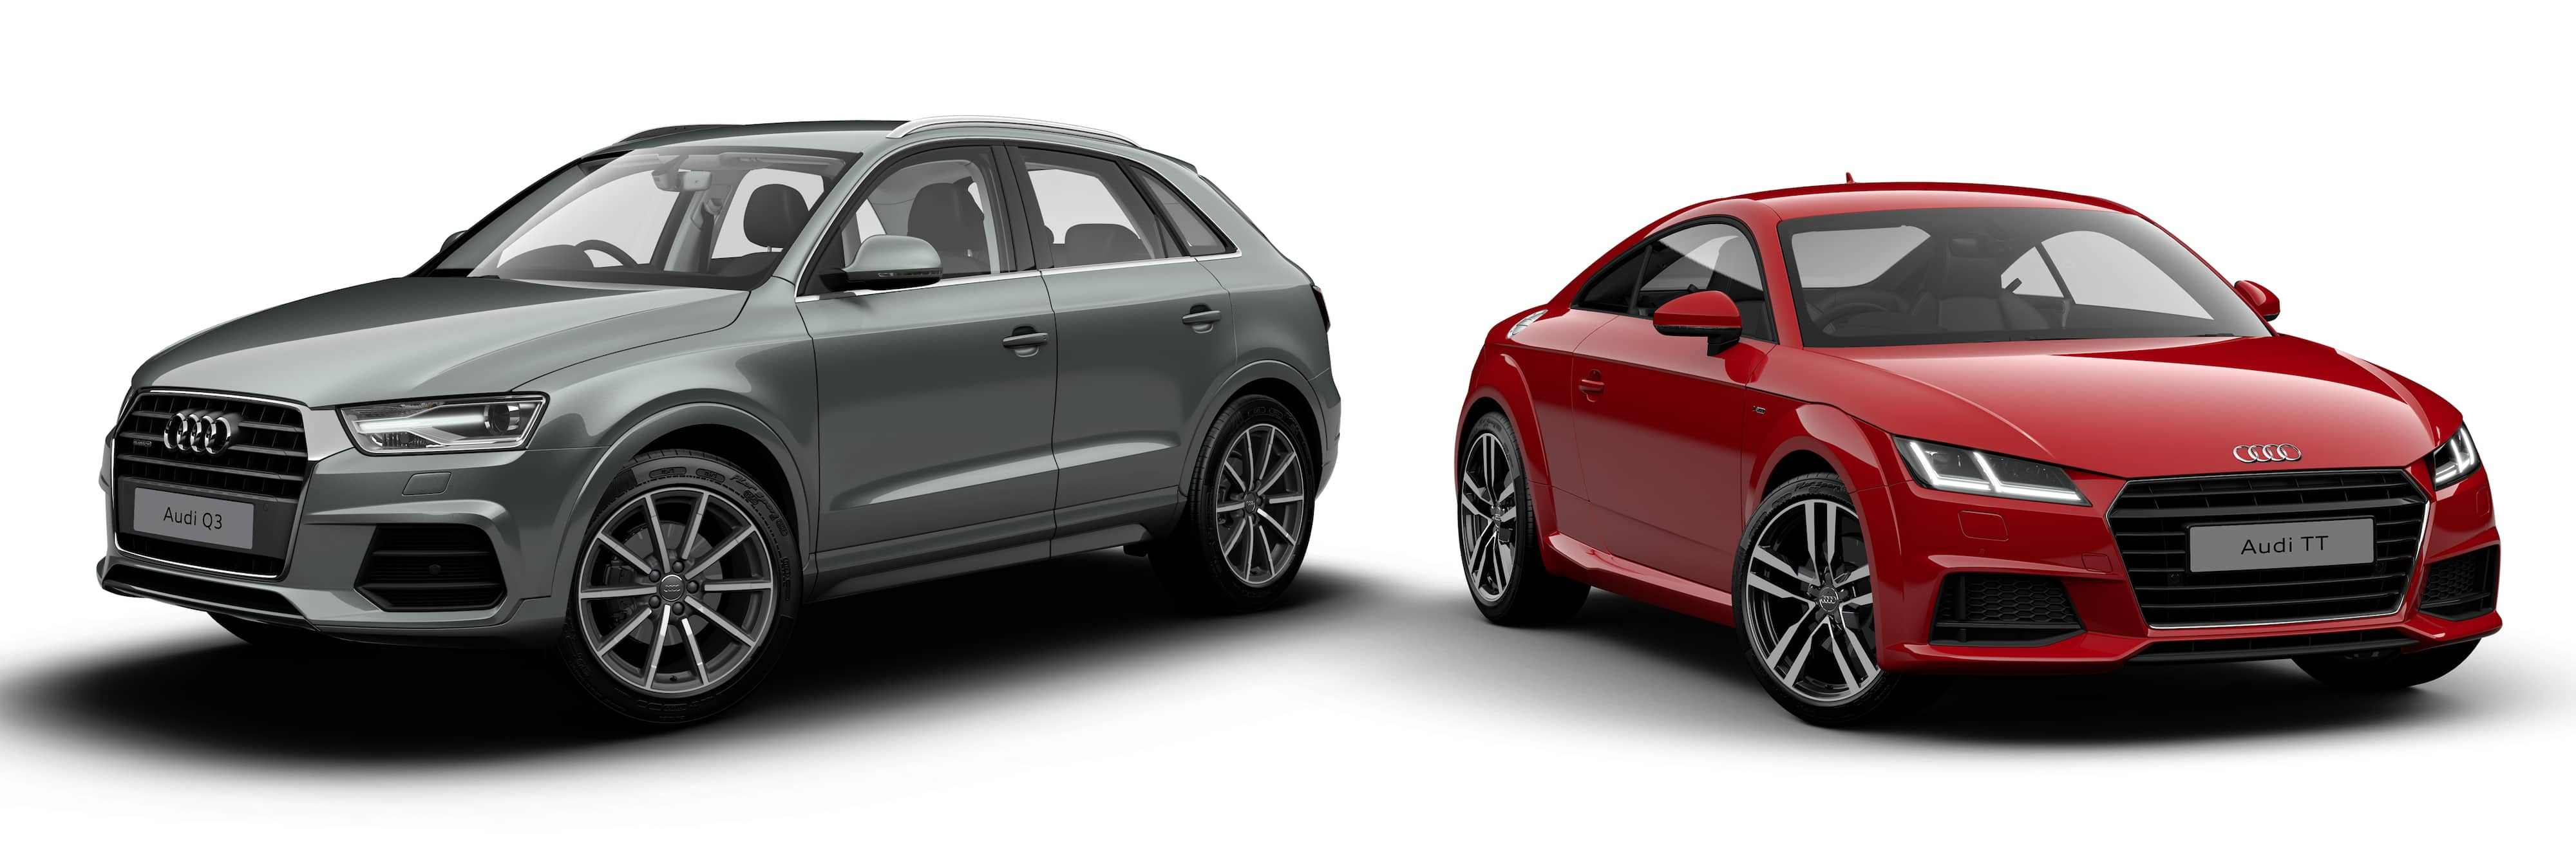 Audi Service Gt Owners Gt Audi Australia Luxury